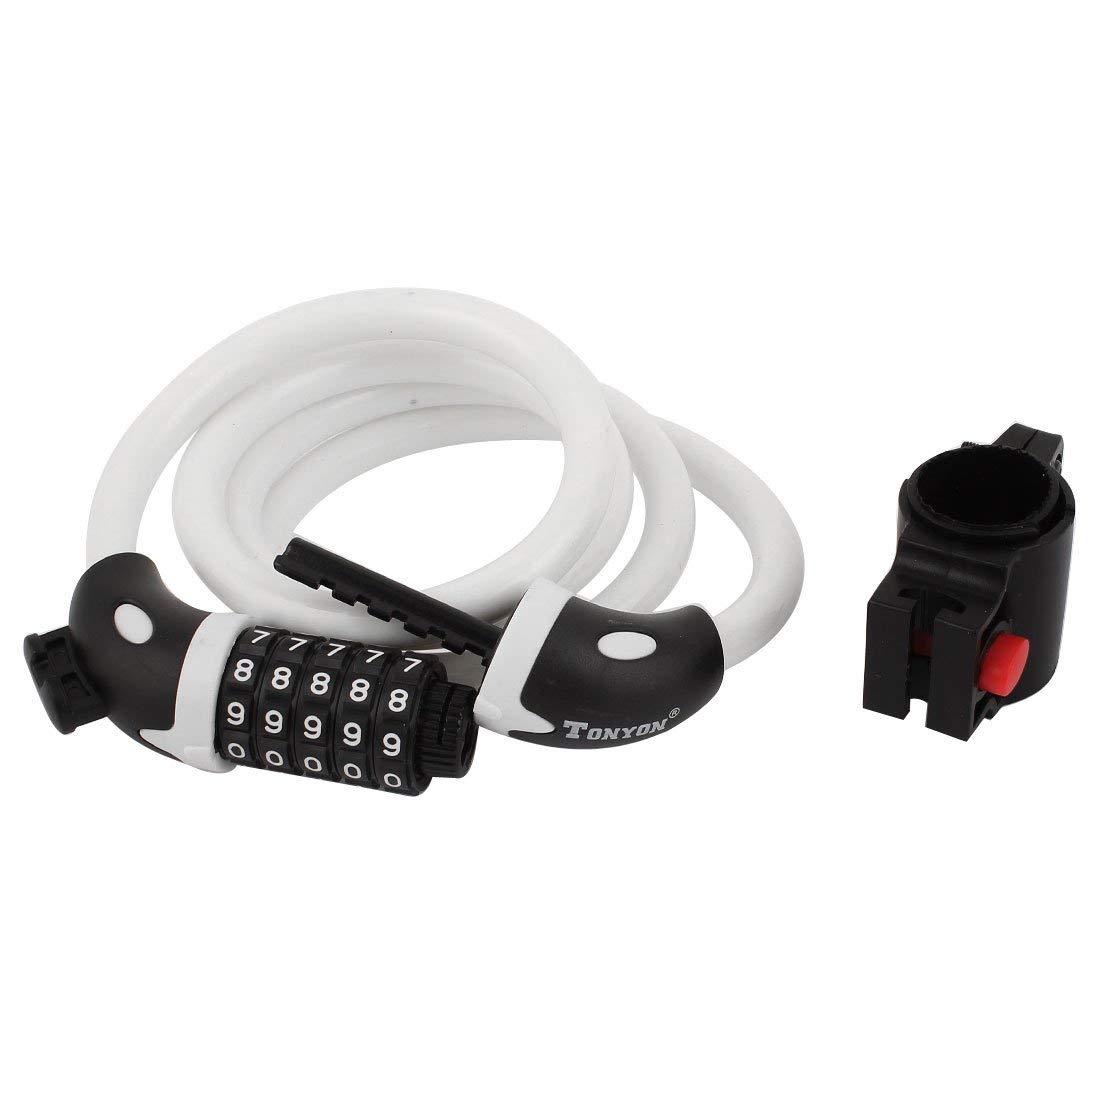 Aexit Motorcycle Bicycle Bike Locks Spiral Steel Wire Cable 5-Digit Combination U-Locks Lock White